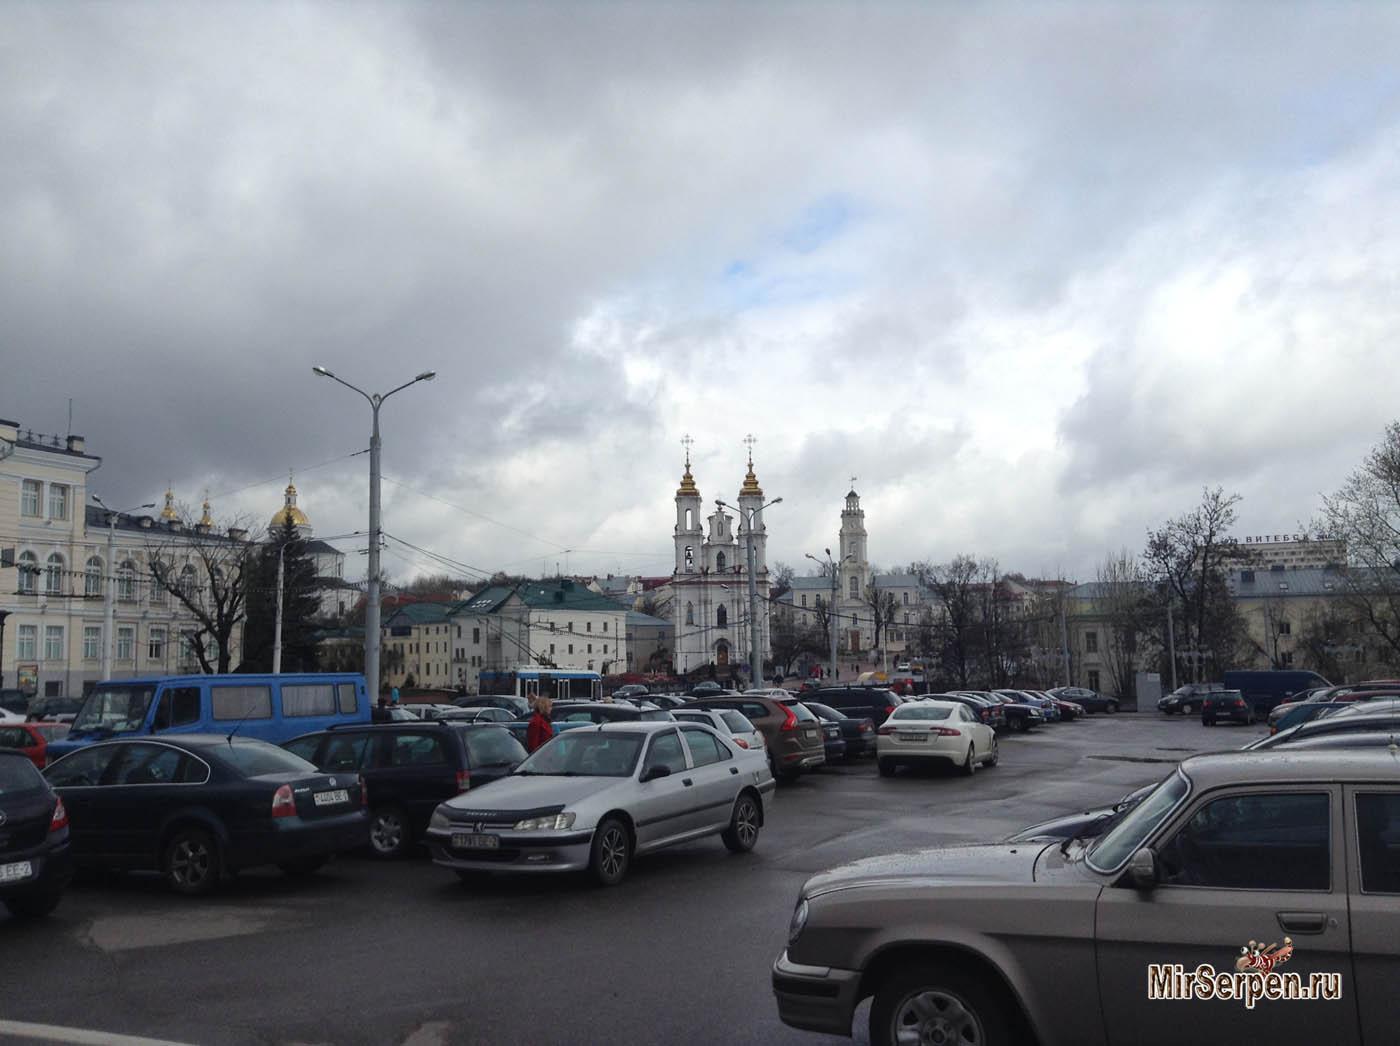 Климат и погода в Витебске